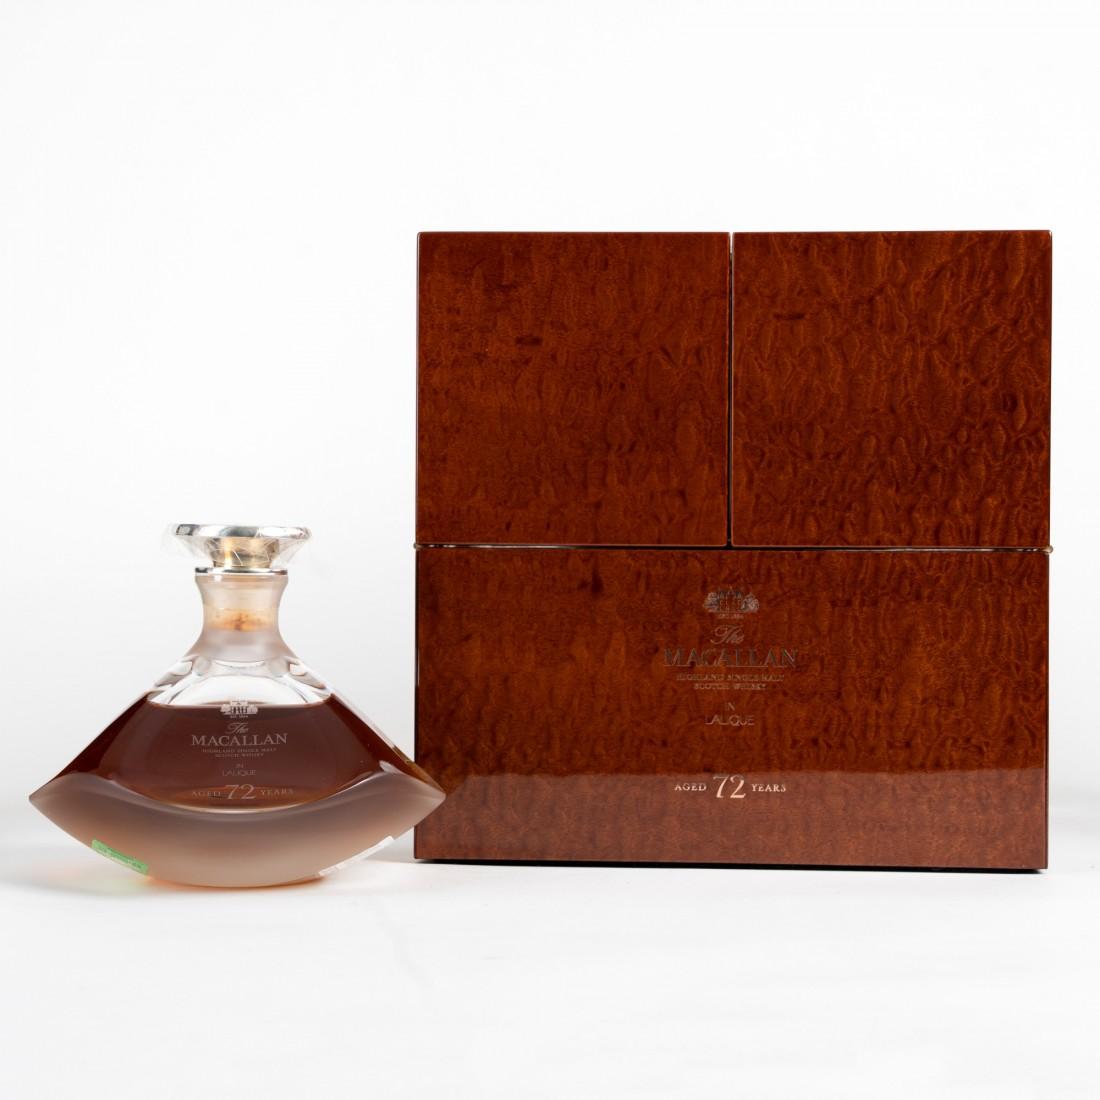 Macallan 72 Year Old Lalique Genesis Decanter